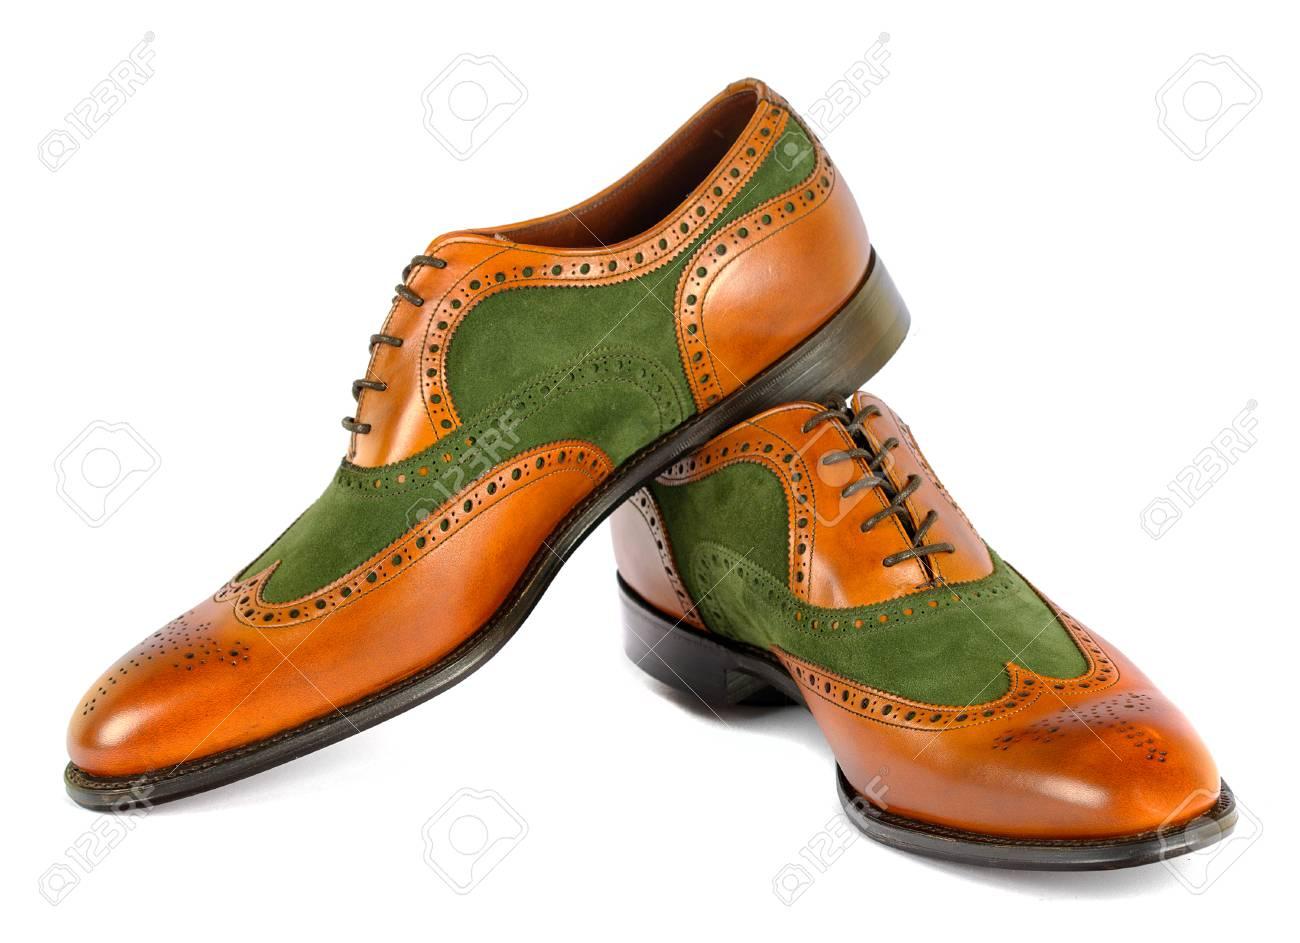 Men's Spectator Style Dress Shoes